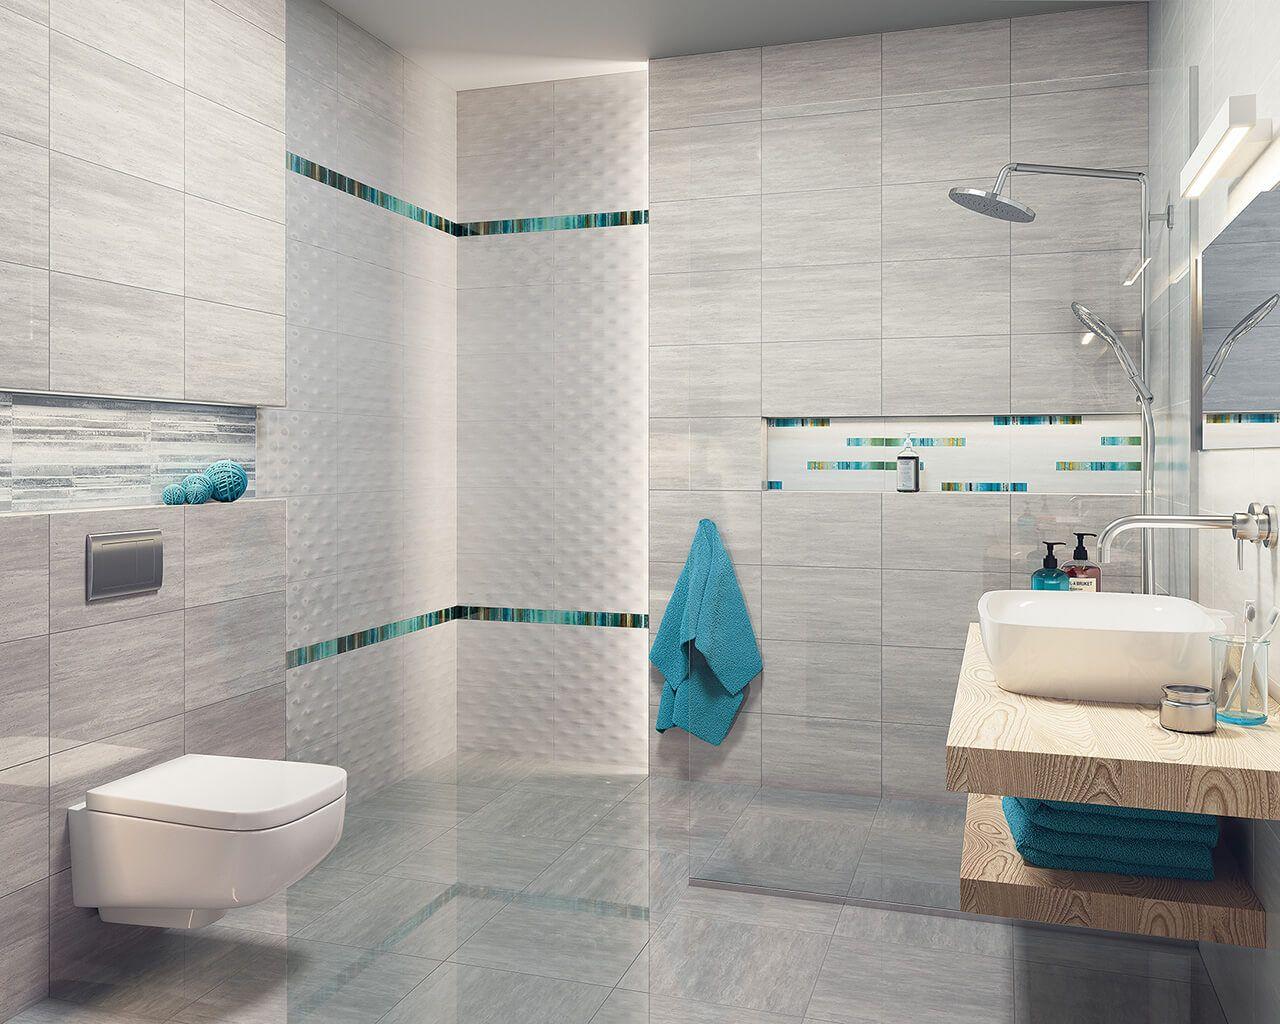 Light-grey bathroom with turquoise decorations | Ceramika Paradyz